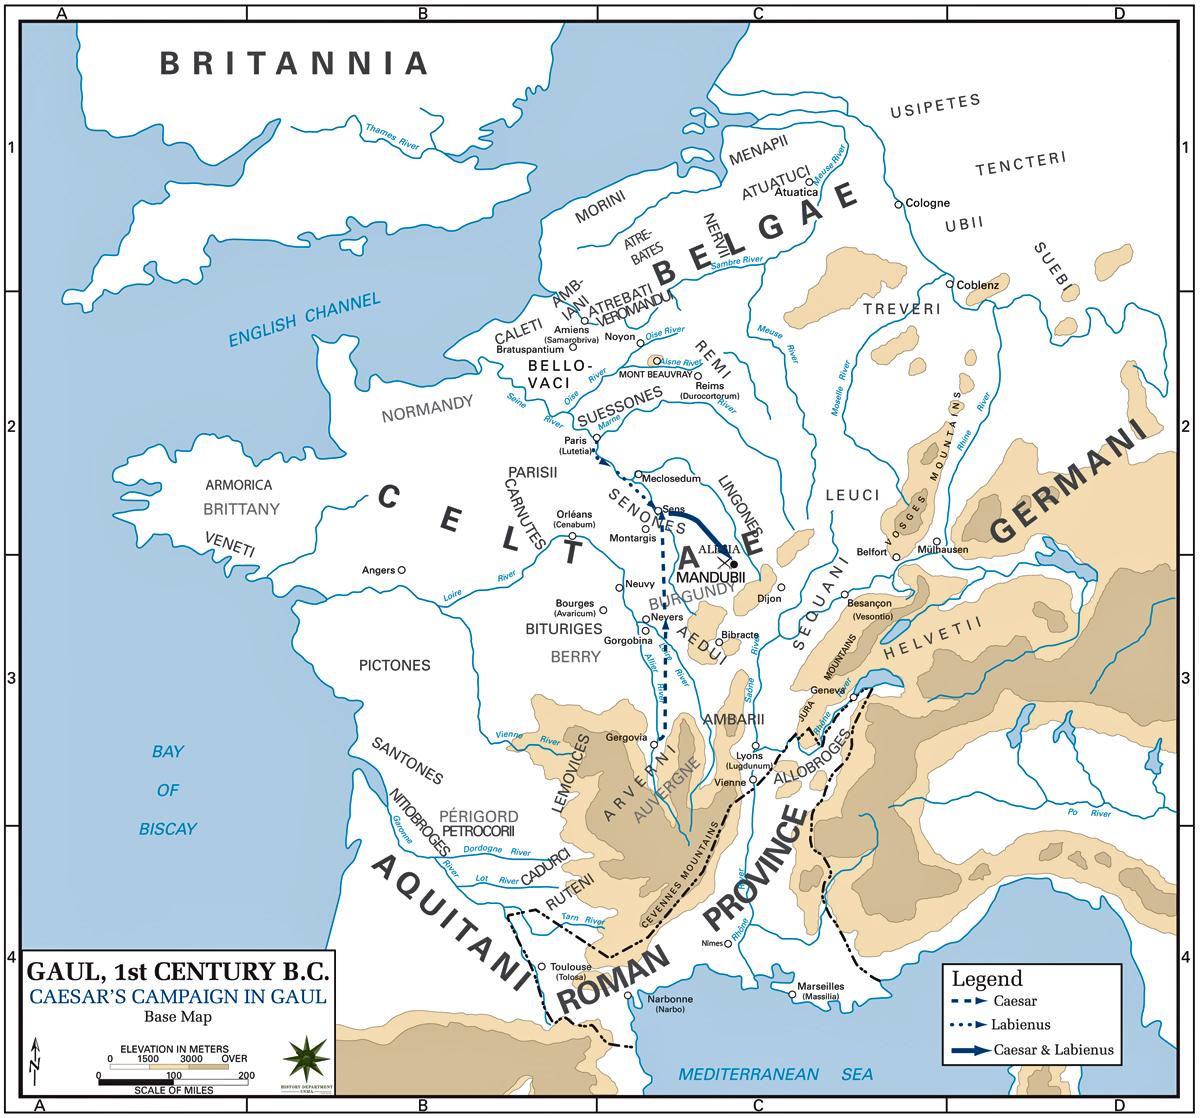 Caesar Campaigns 52 BC in Gaul Map gergovia_alesia .jpg